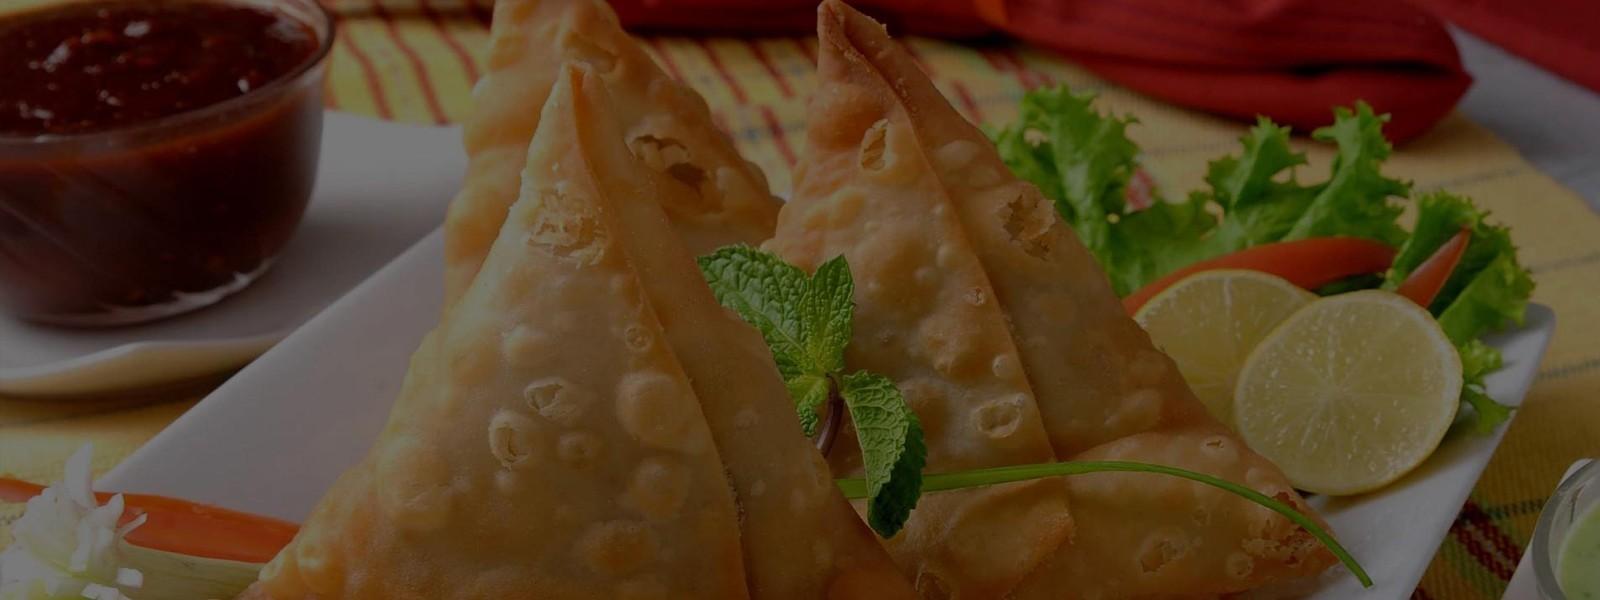 Now Serving samosas Vegetable samosas & Chicken samosas 11:30 AM to 5:30 PM